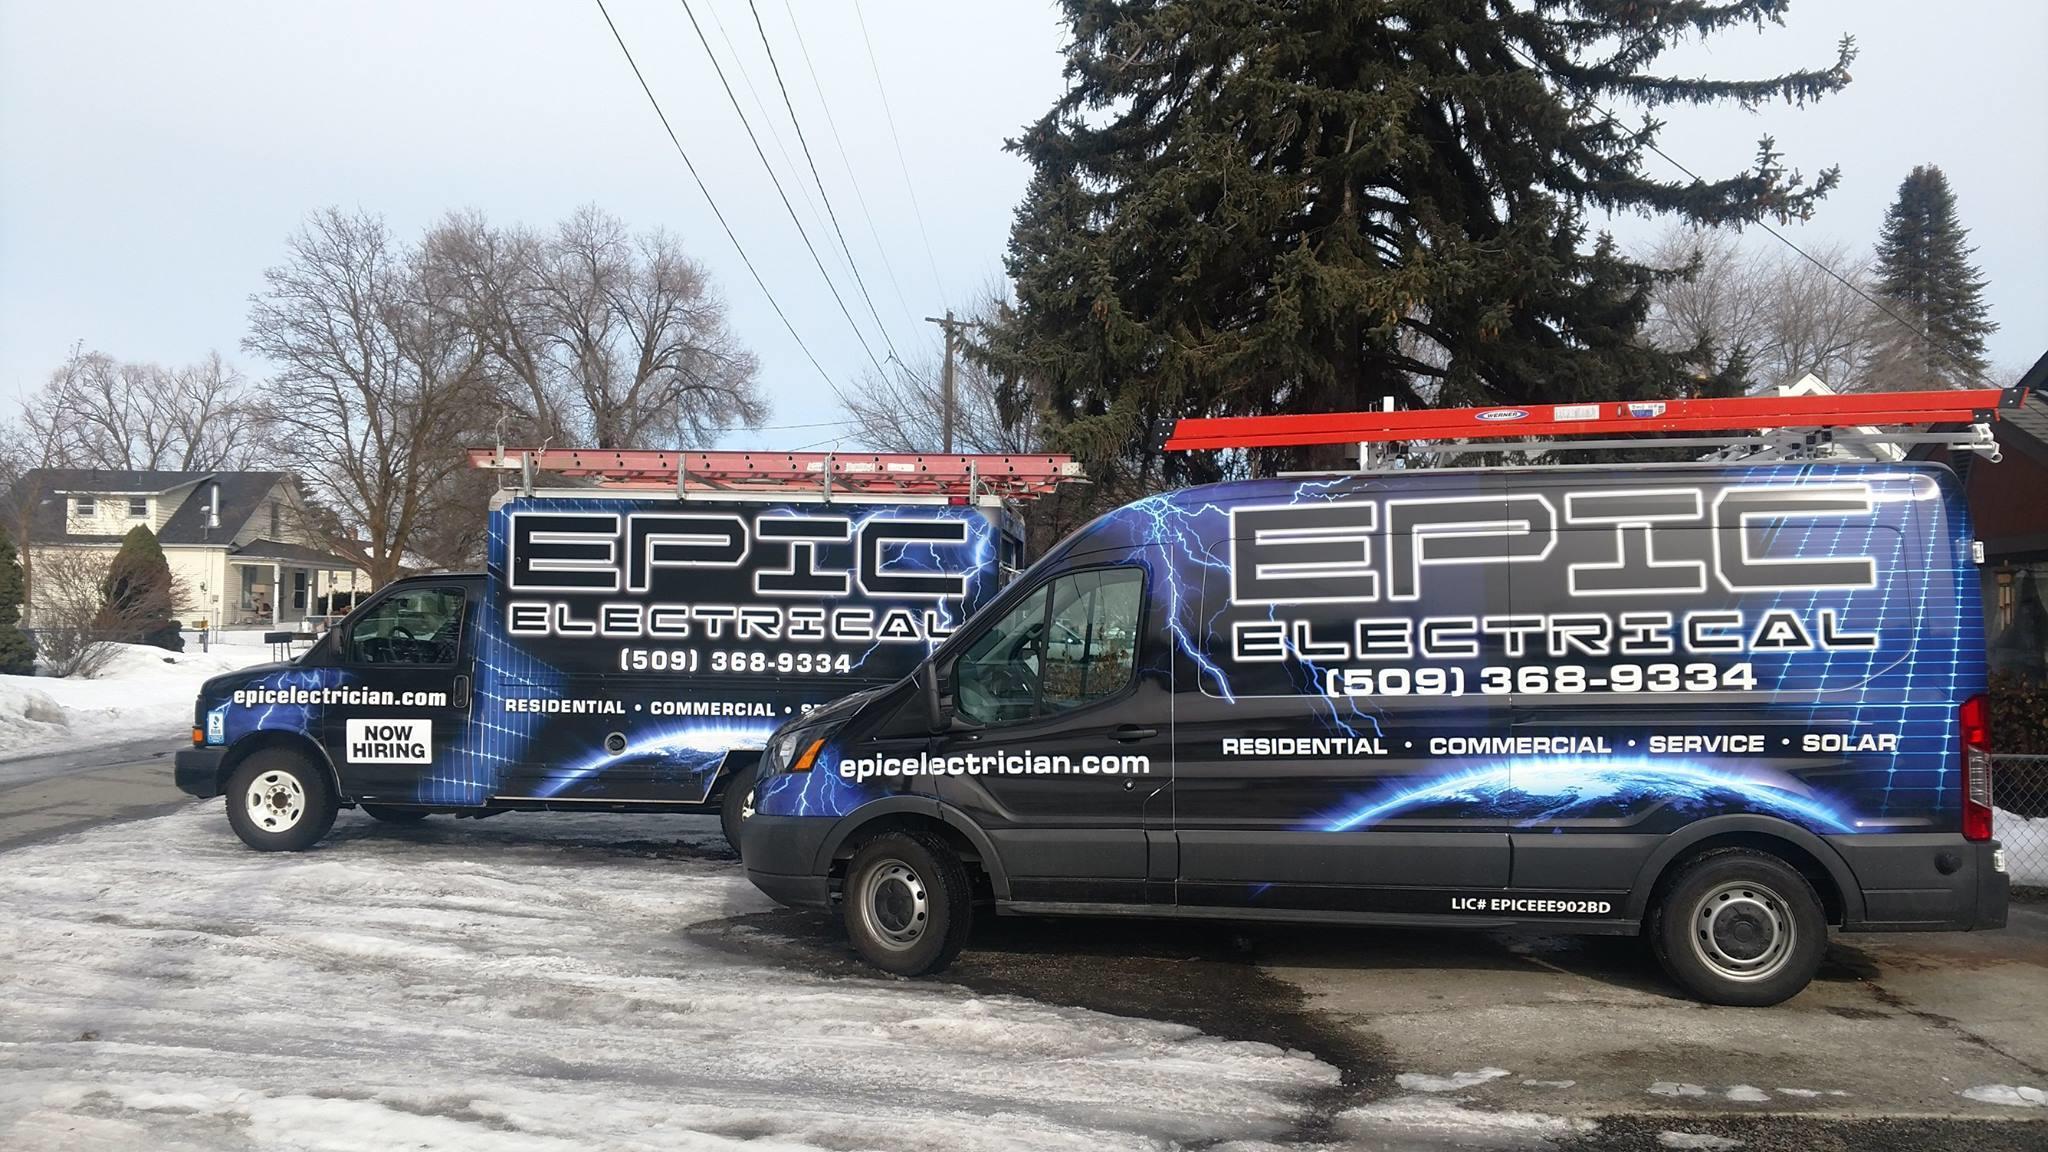 Epic Electrical Enterprise, LLC image 4